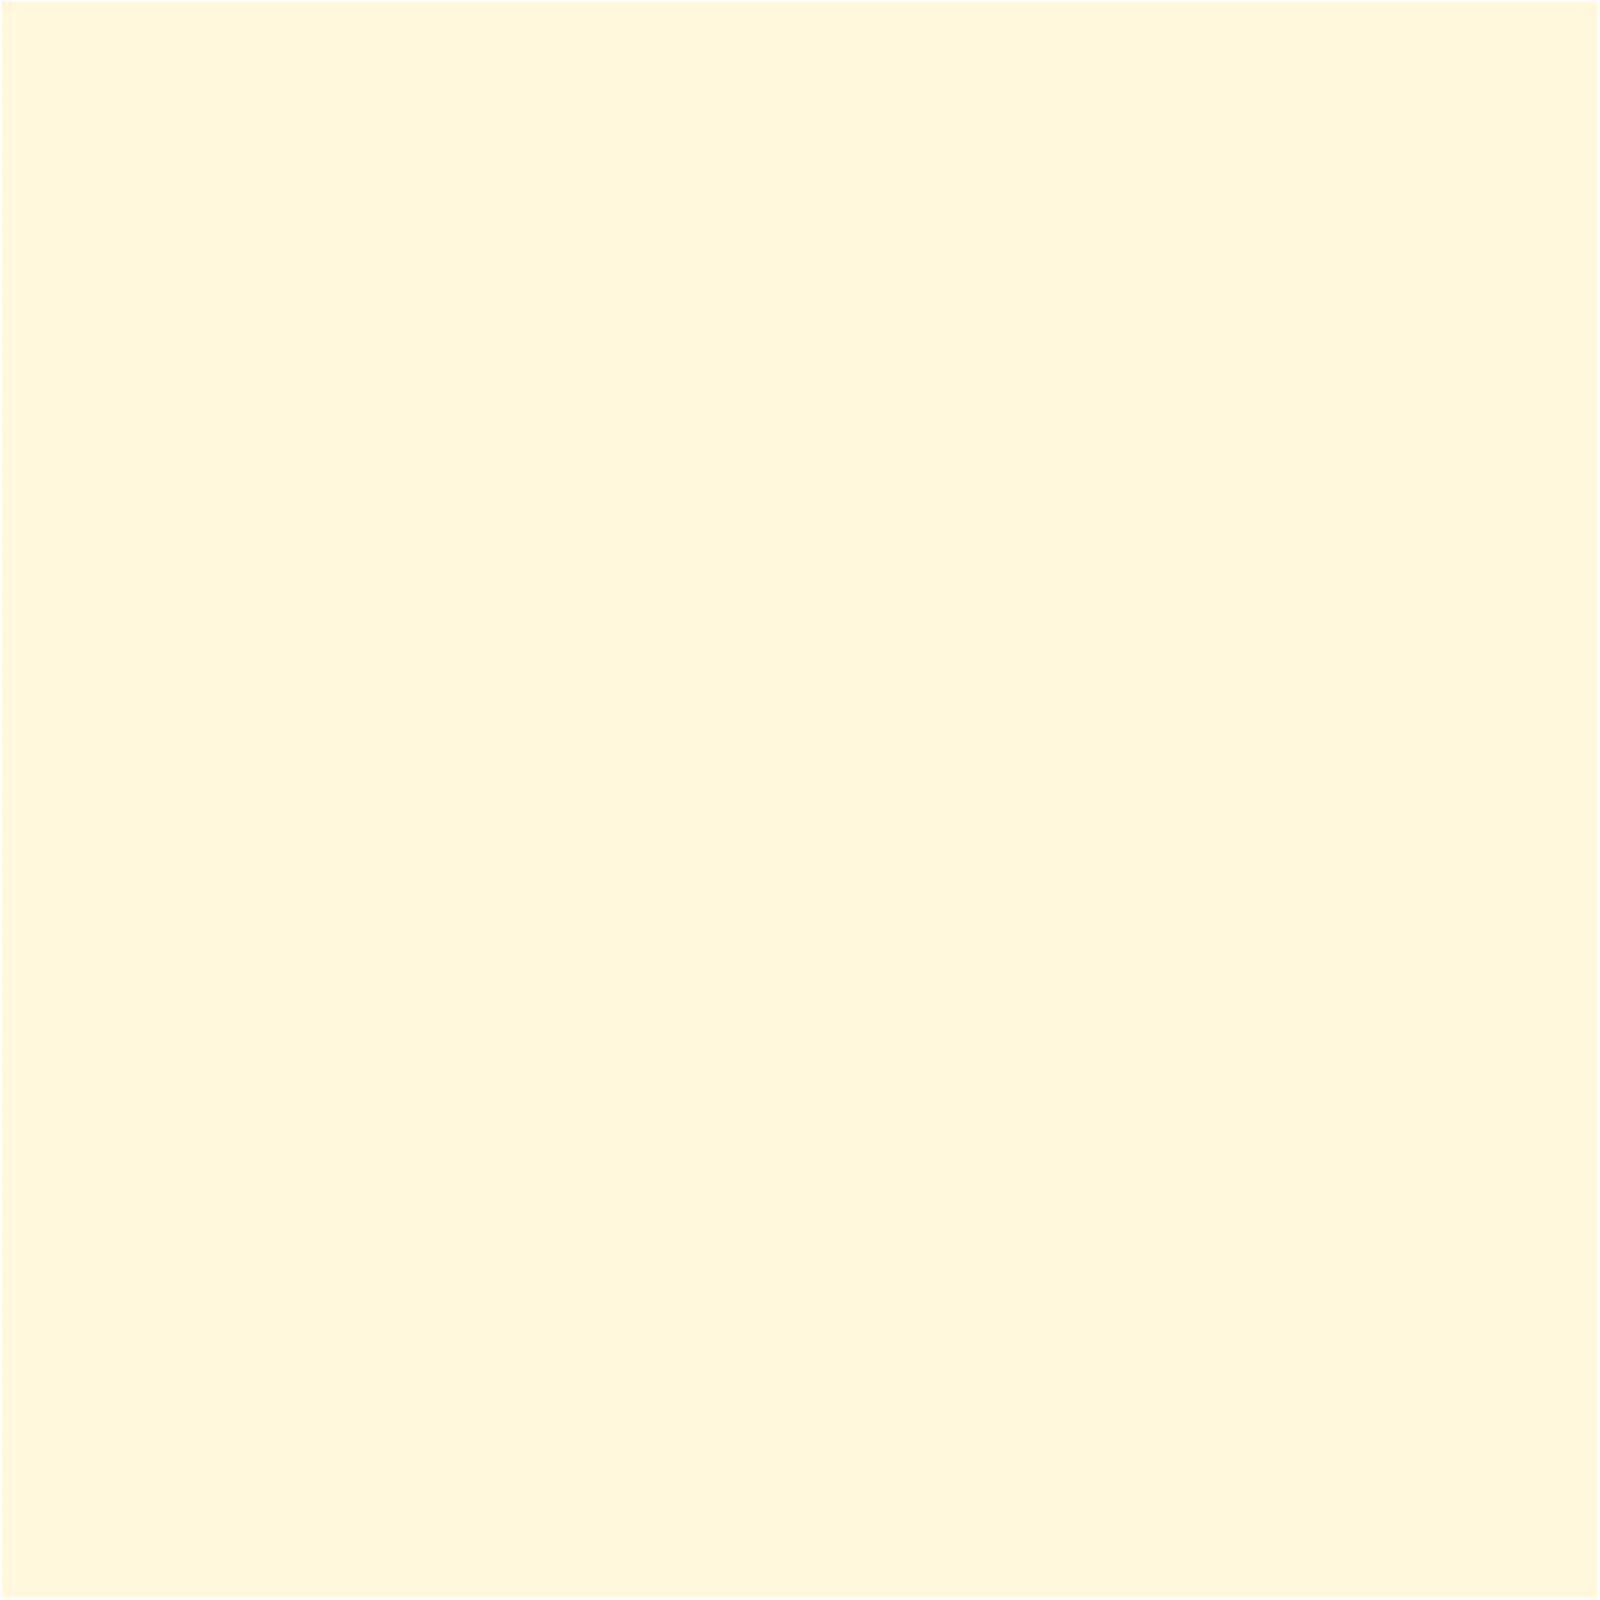 ivoriu